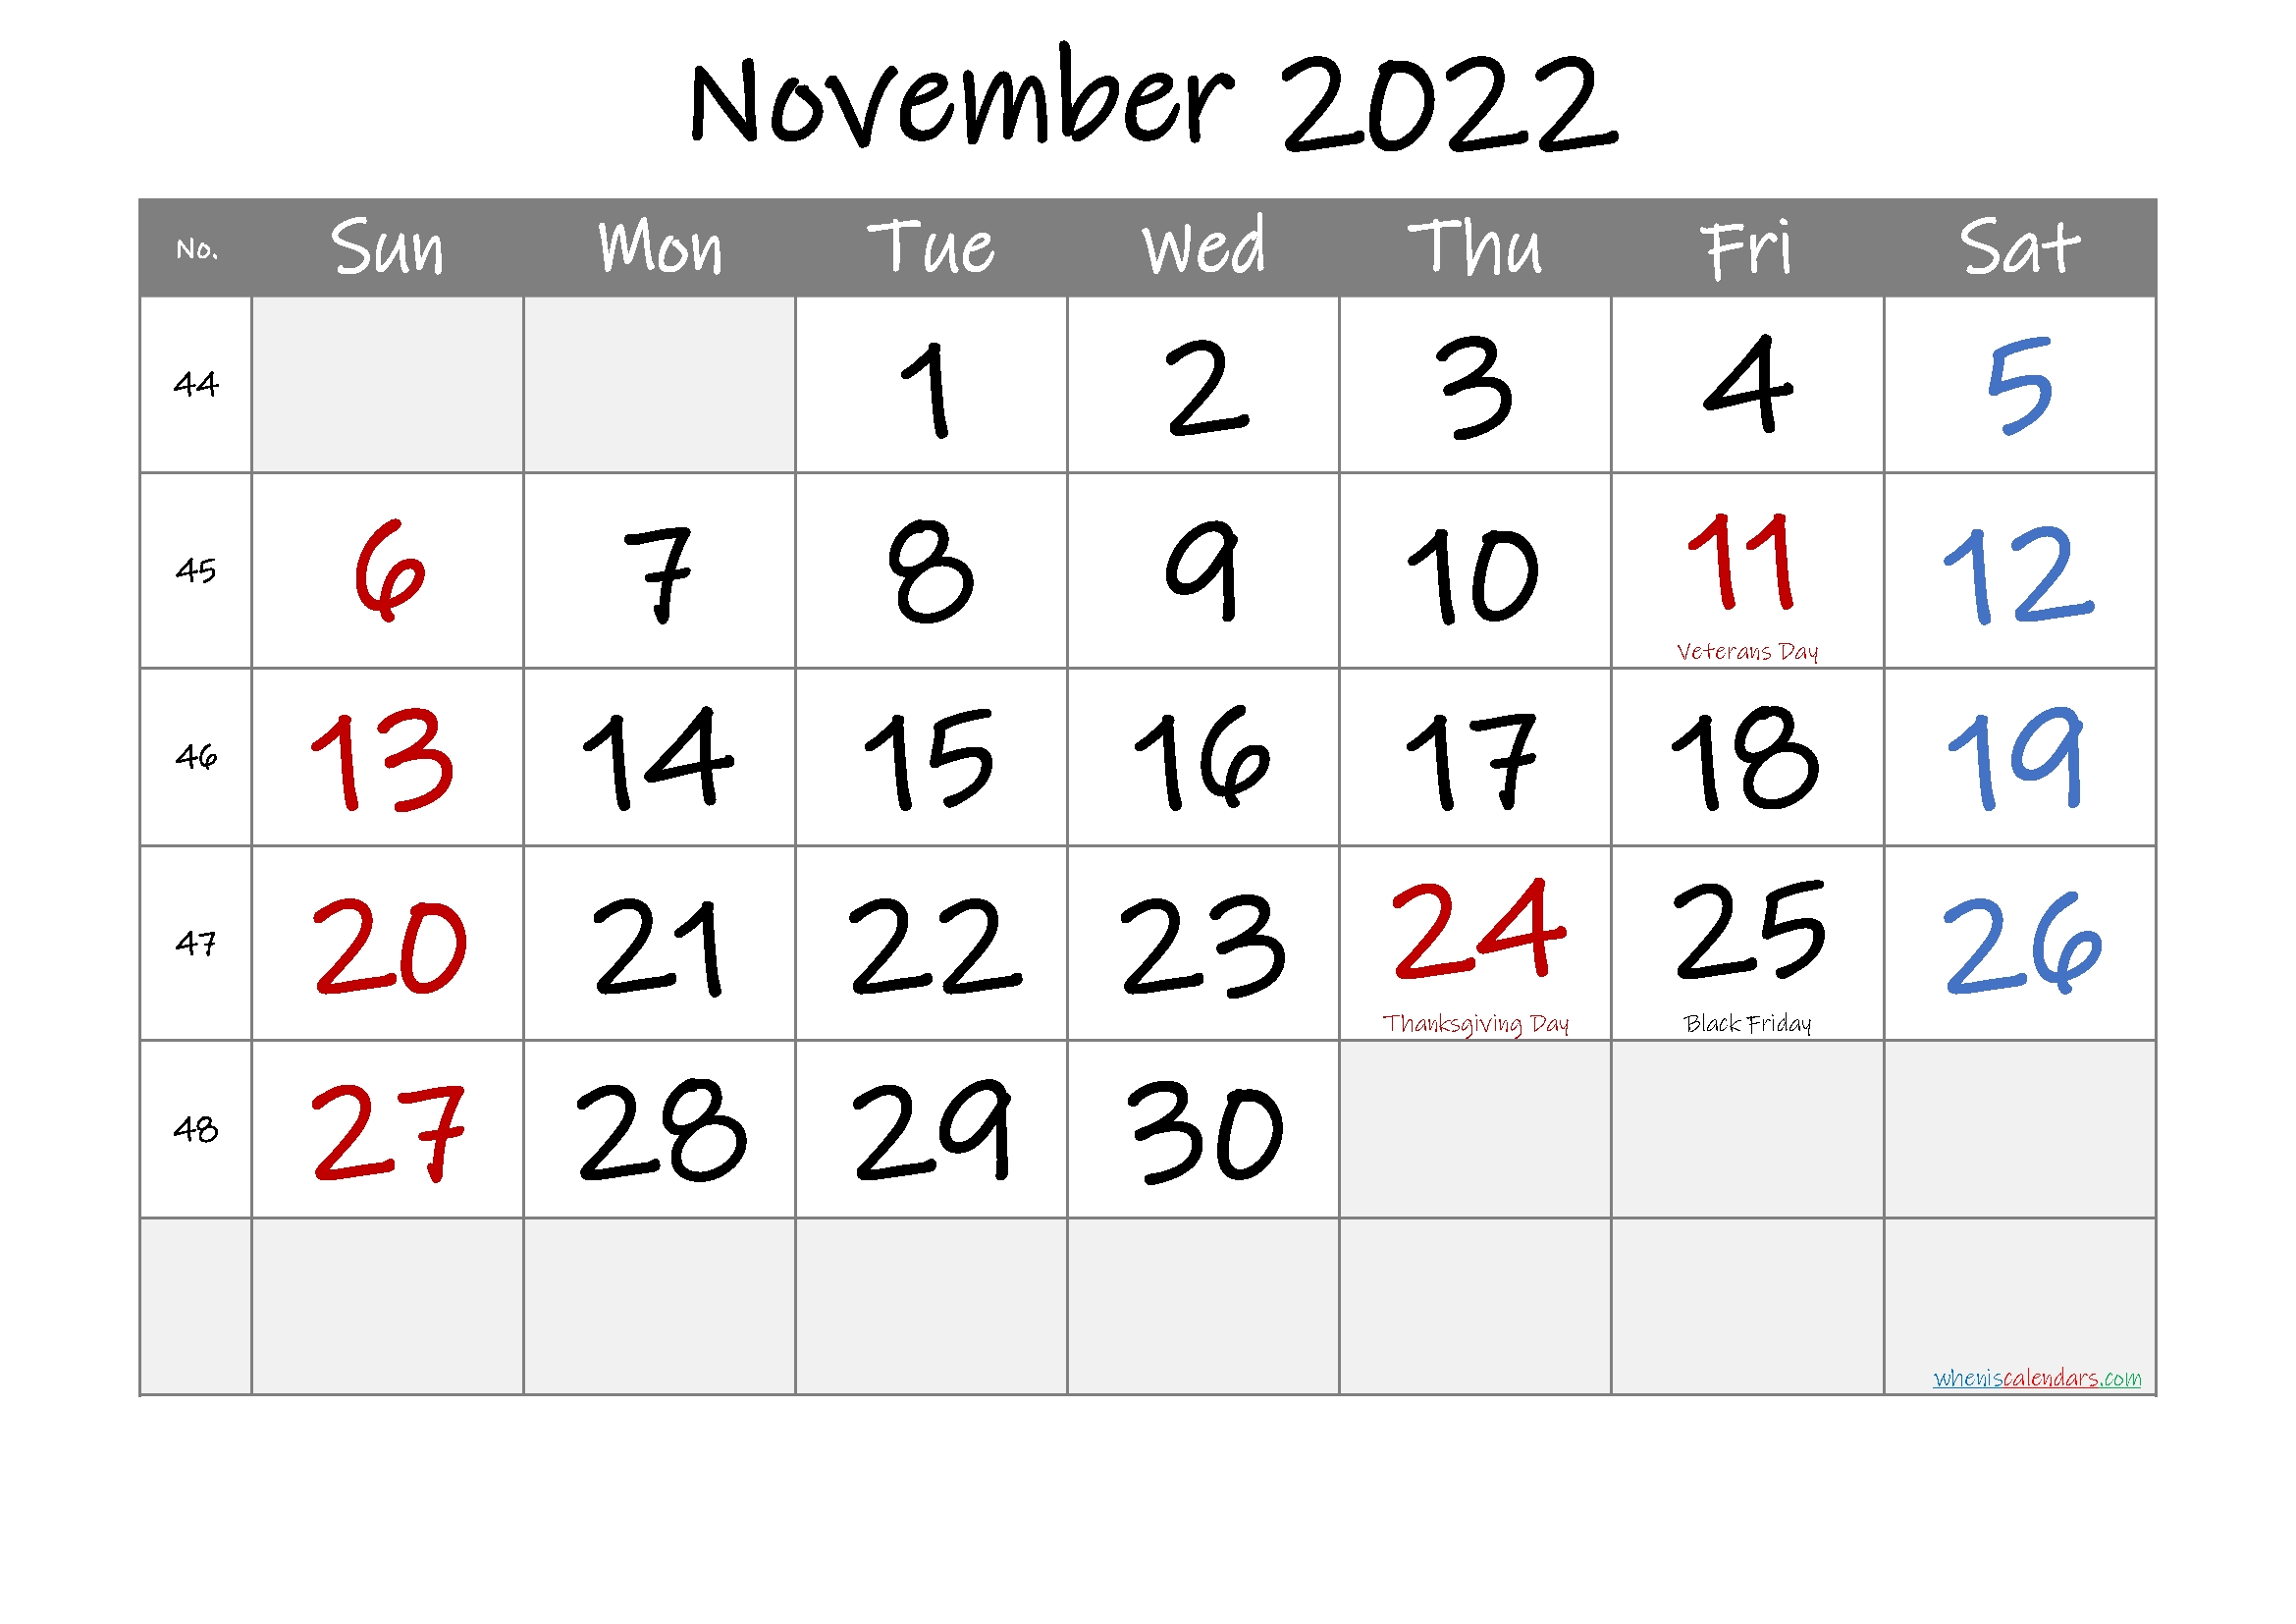 November 2022 Free Printable Calendar-Template No.if22M35